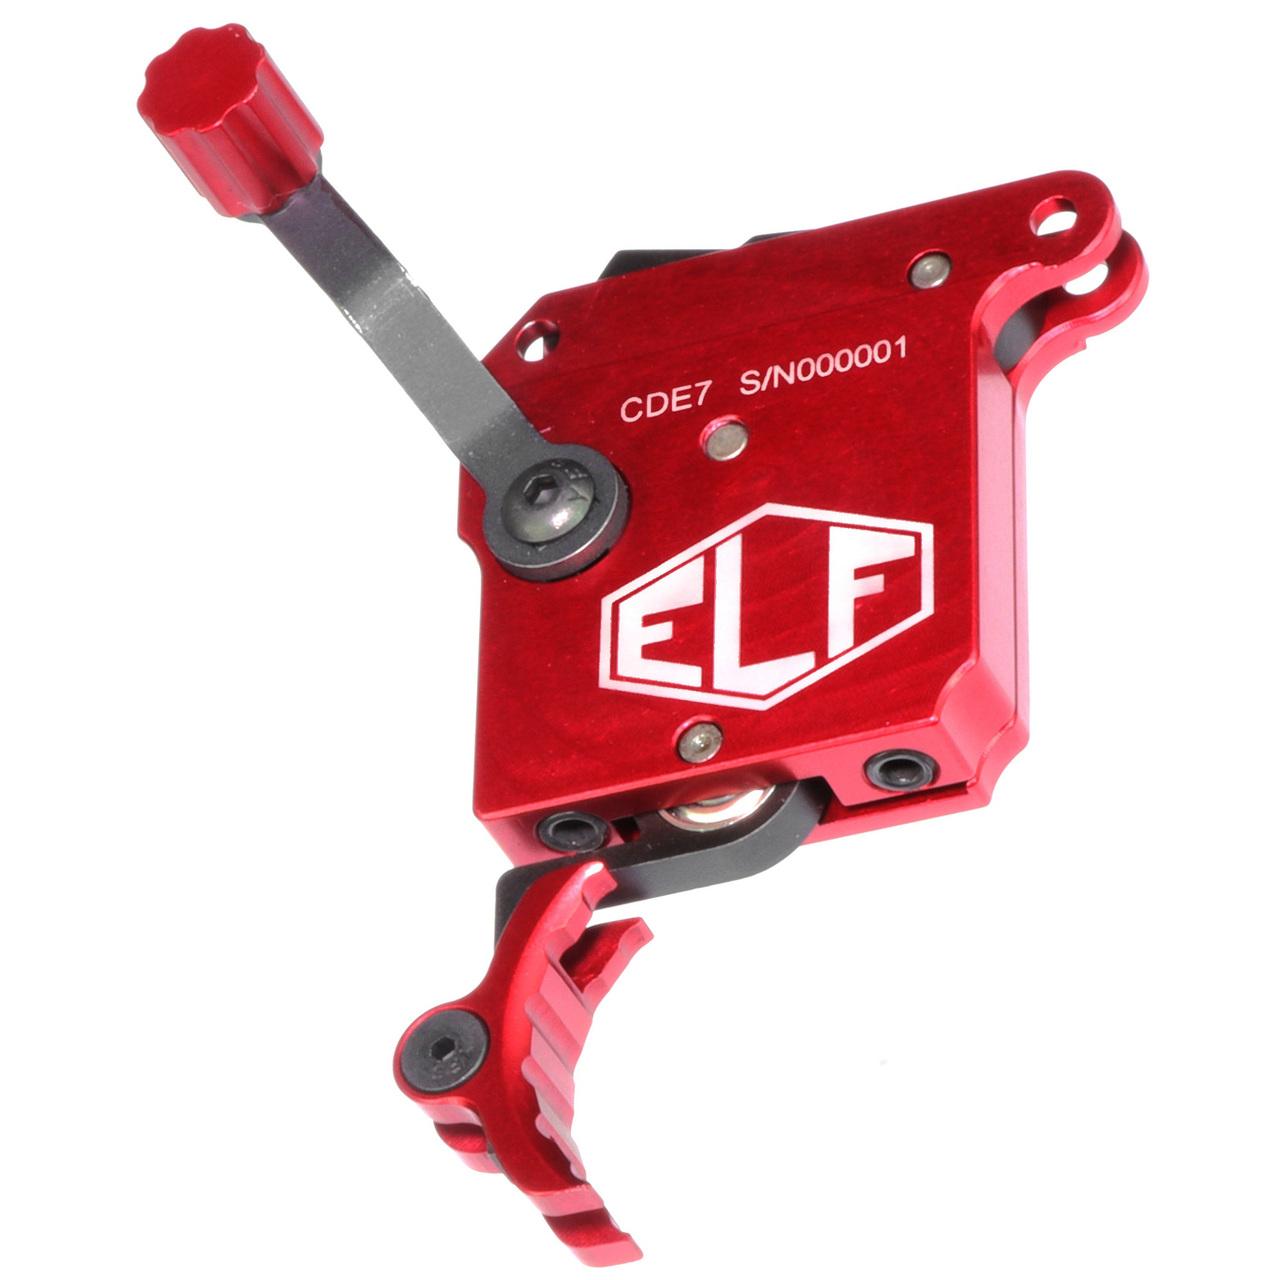 Elftmann Remington 700 Trigger with Bolt Release Red